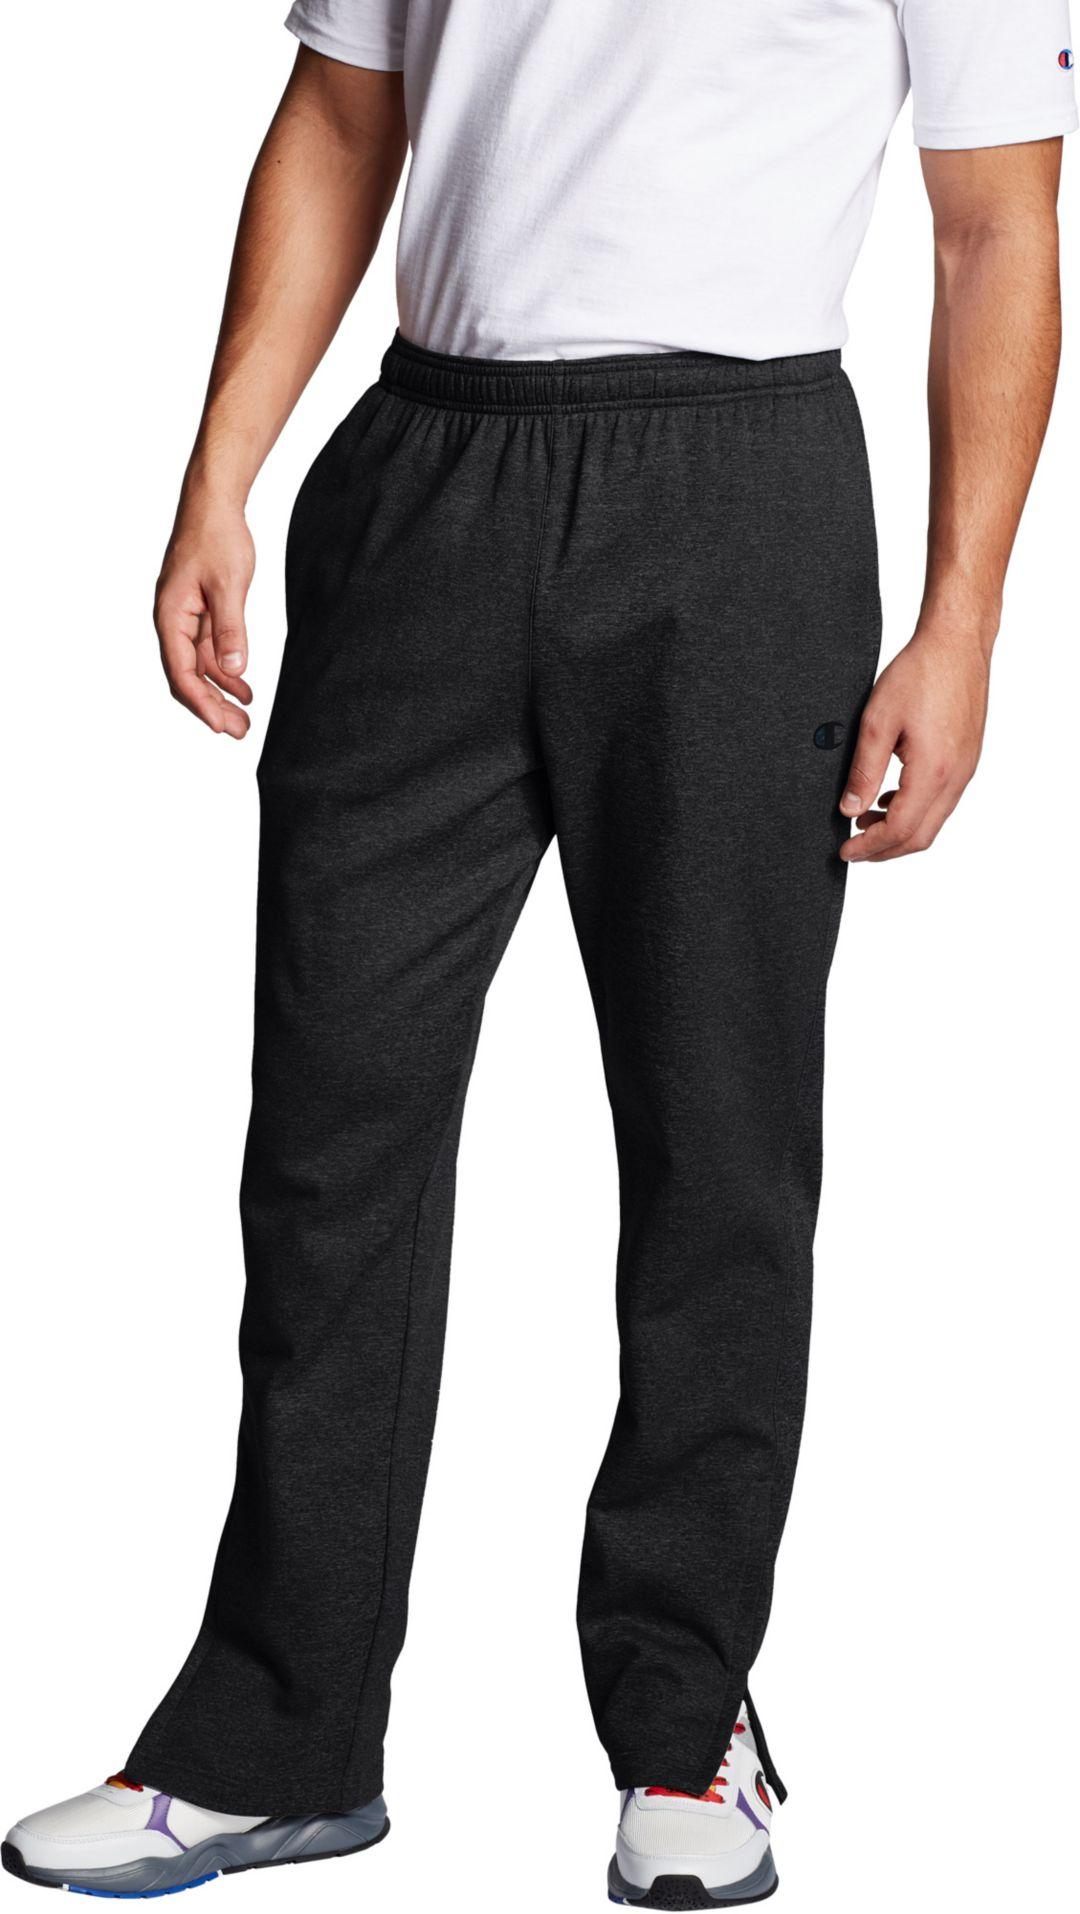 new varieties world-wide free shipping new styles Champion Men's Tech Fleece Pants